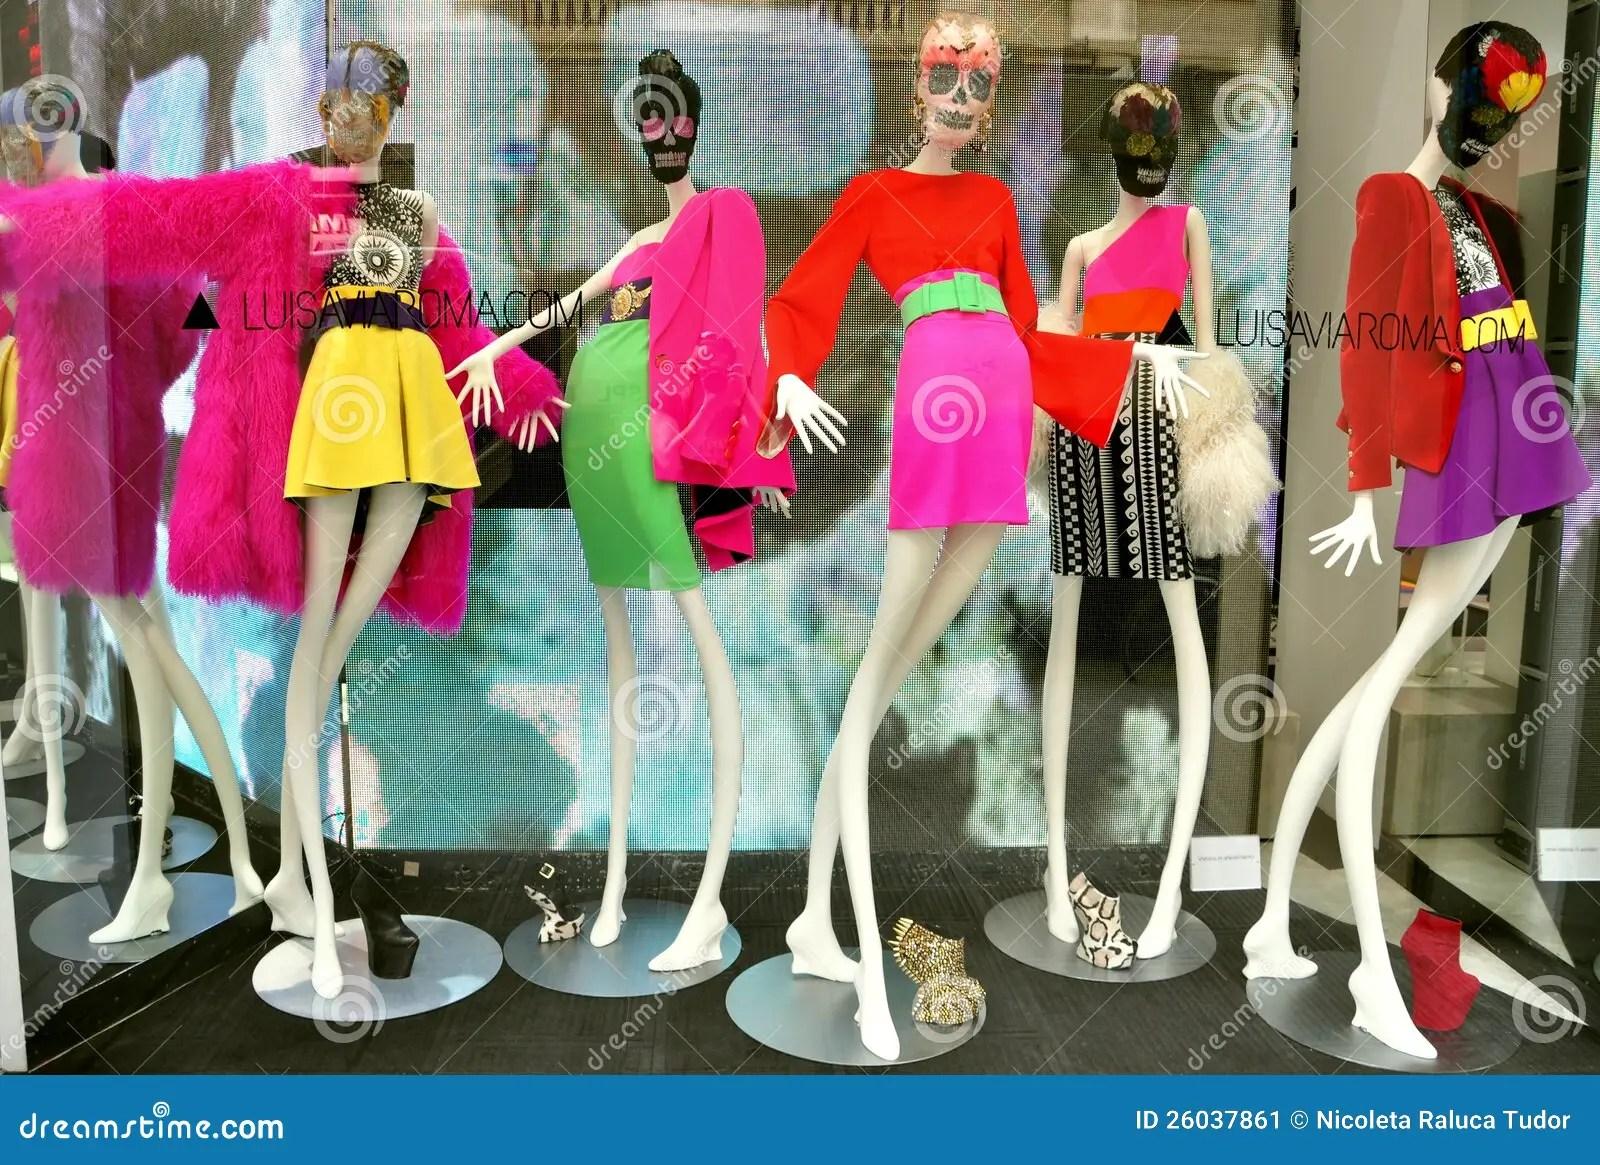 Italian Luxury Fashion Shop In Florence Editorial Photo  Image 26037861